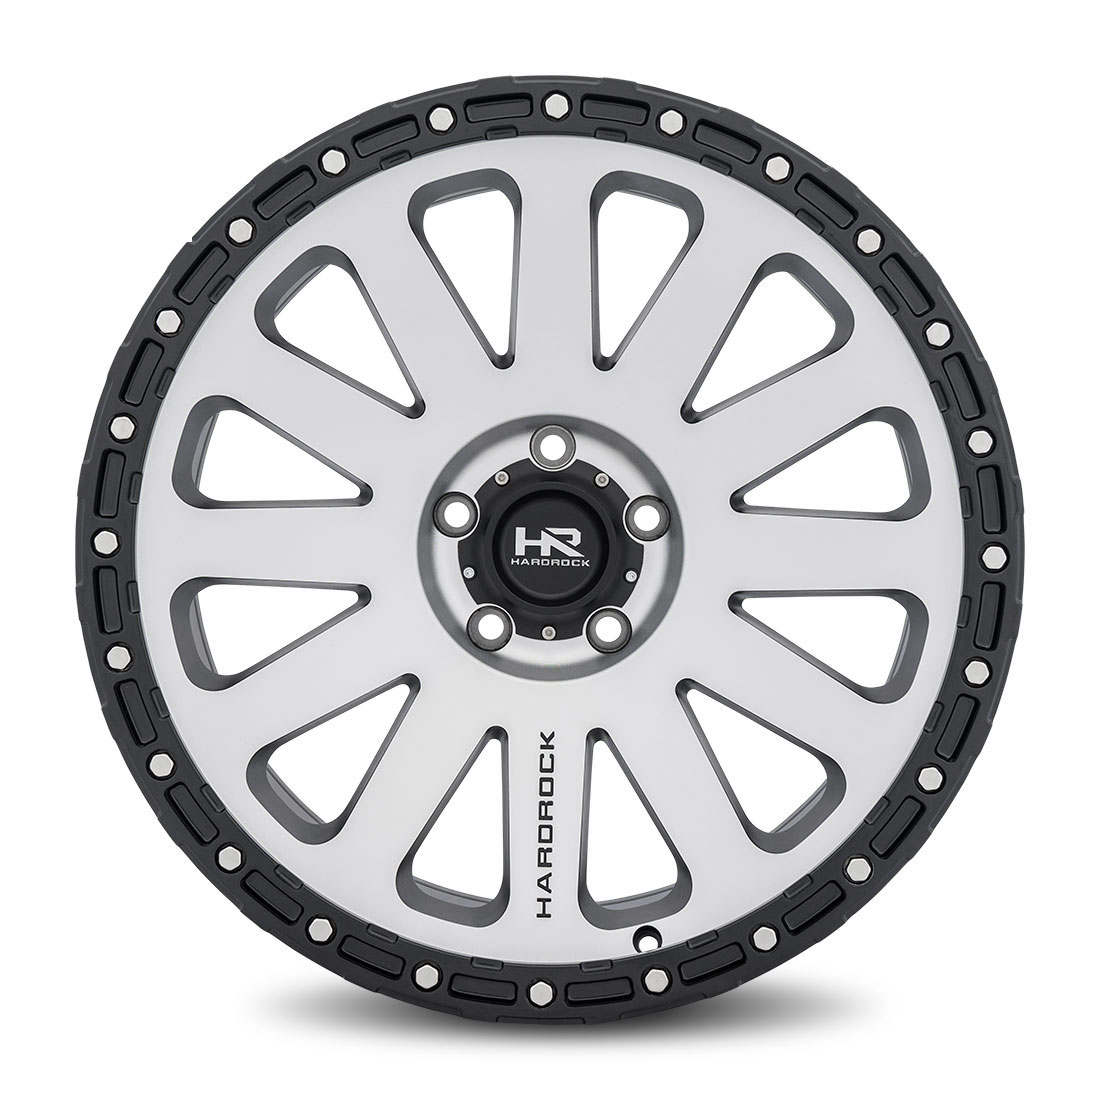 Hardrock Offroad Wheels H102 - Black Machine Face - 20x9